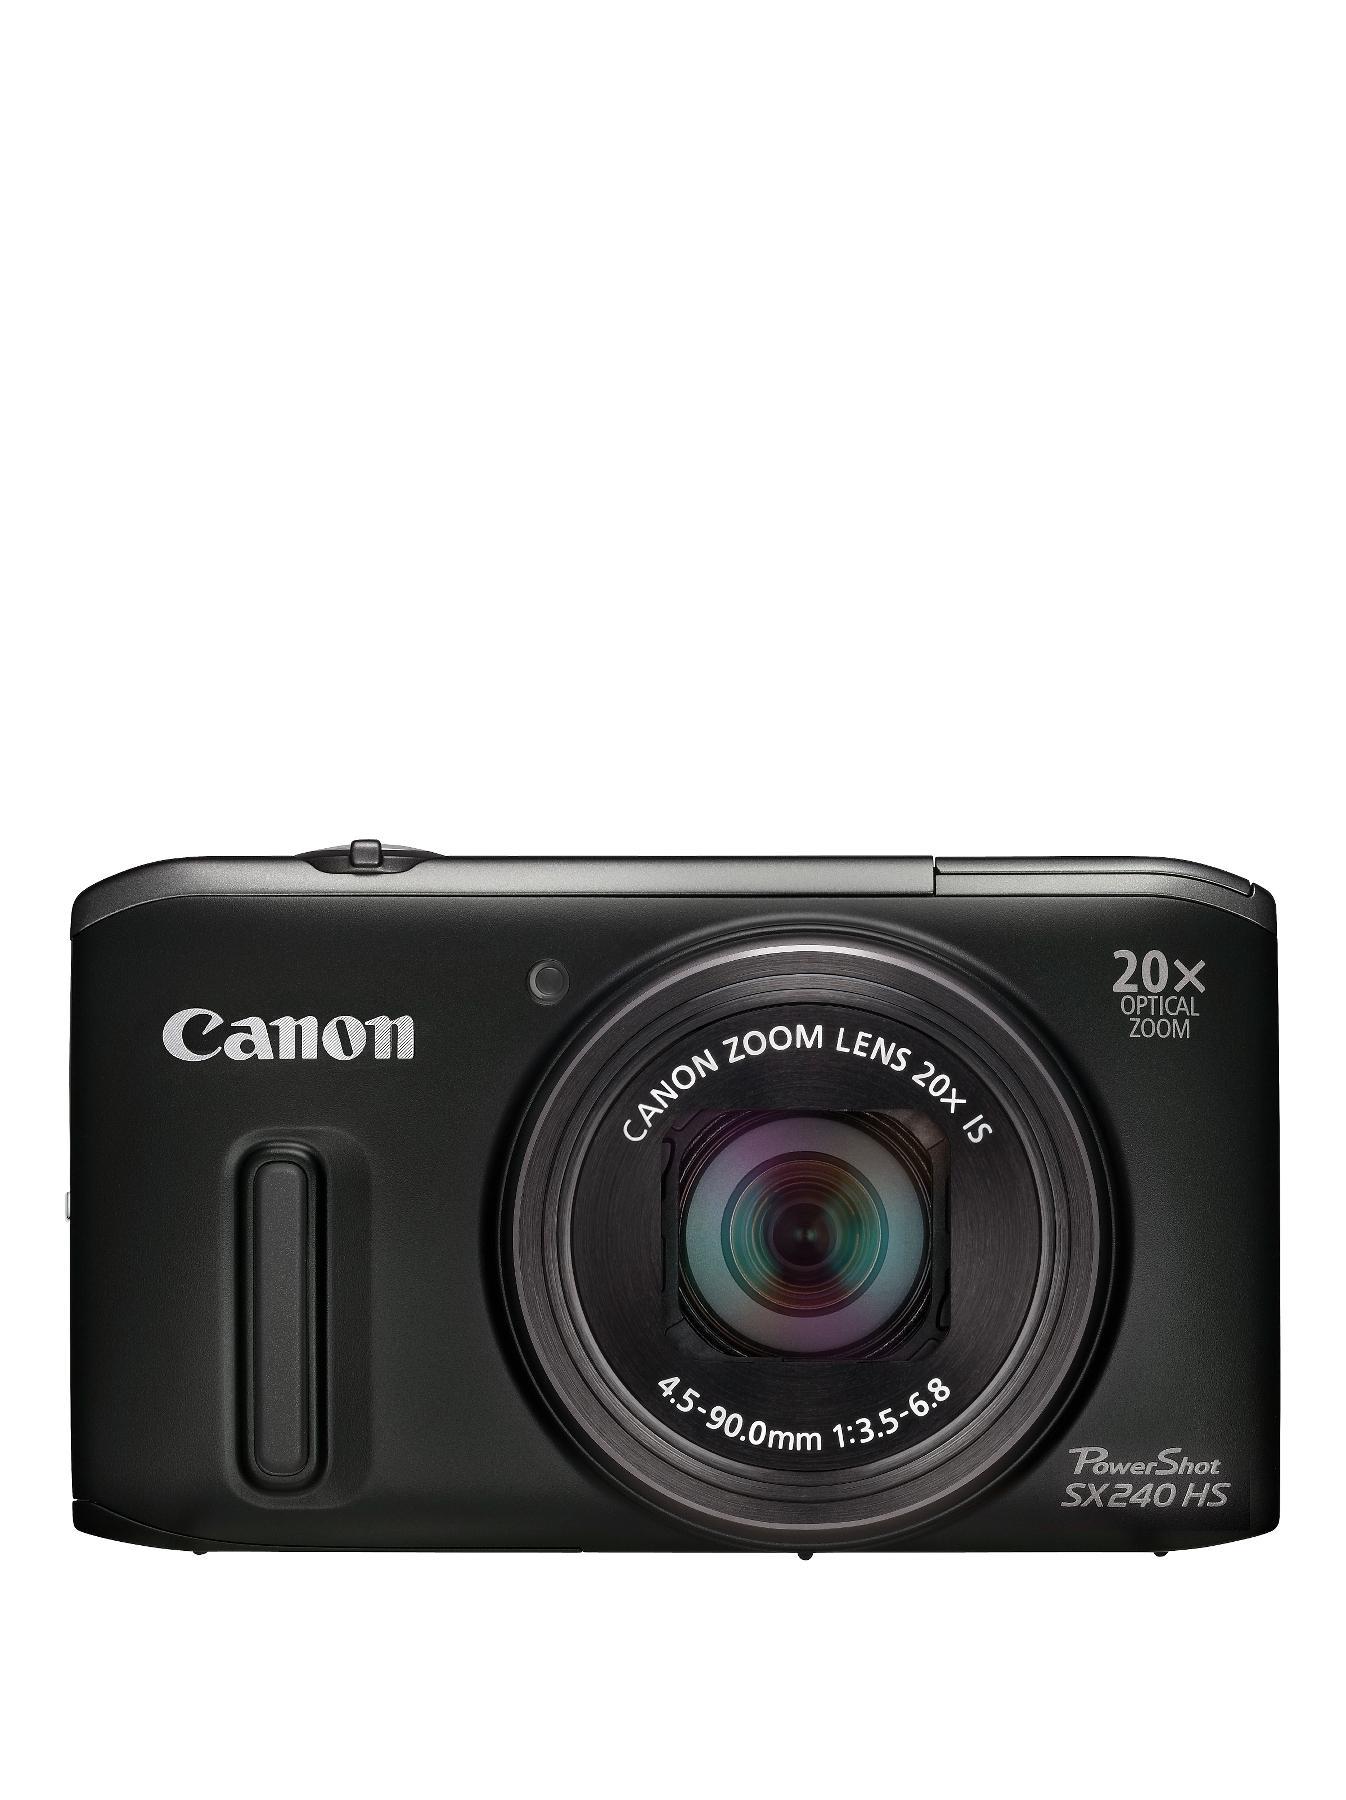 Canon Powershot SX240 HS Digital Camera